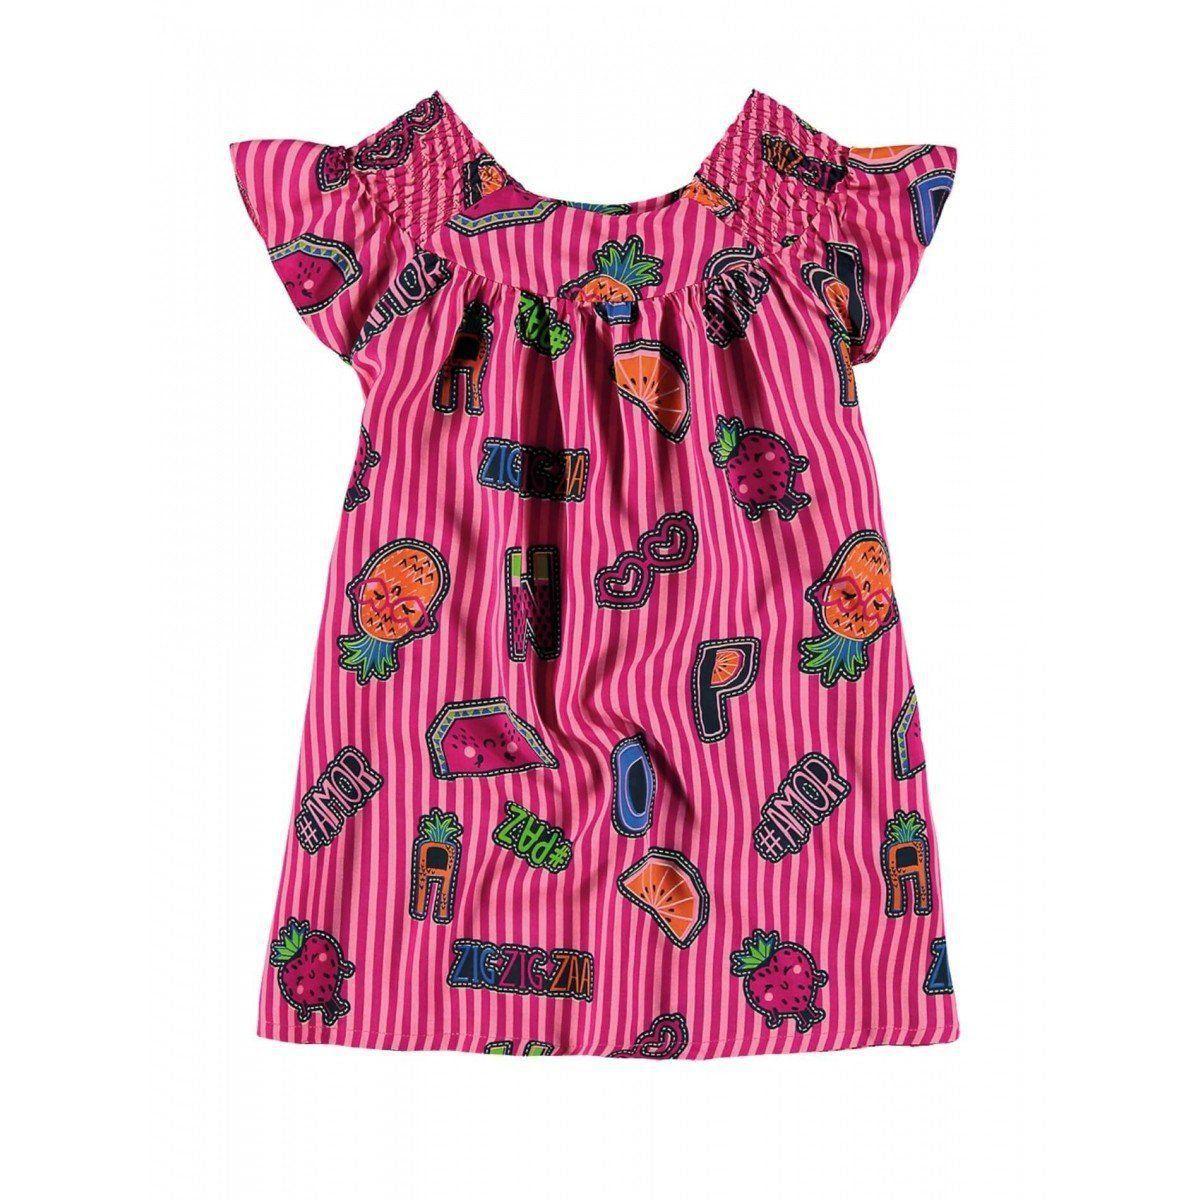 Vestido Infantil Rosa Listrado Frutinhas Zig Zig Zaa